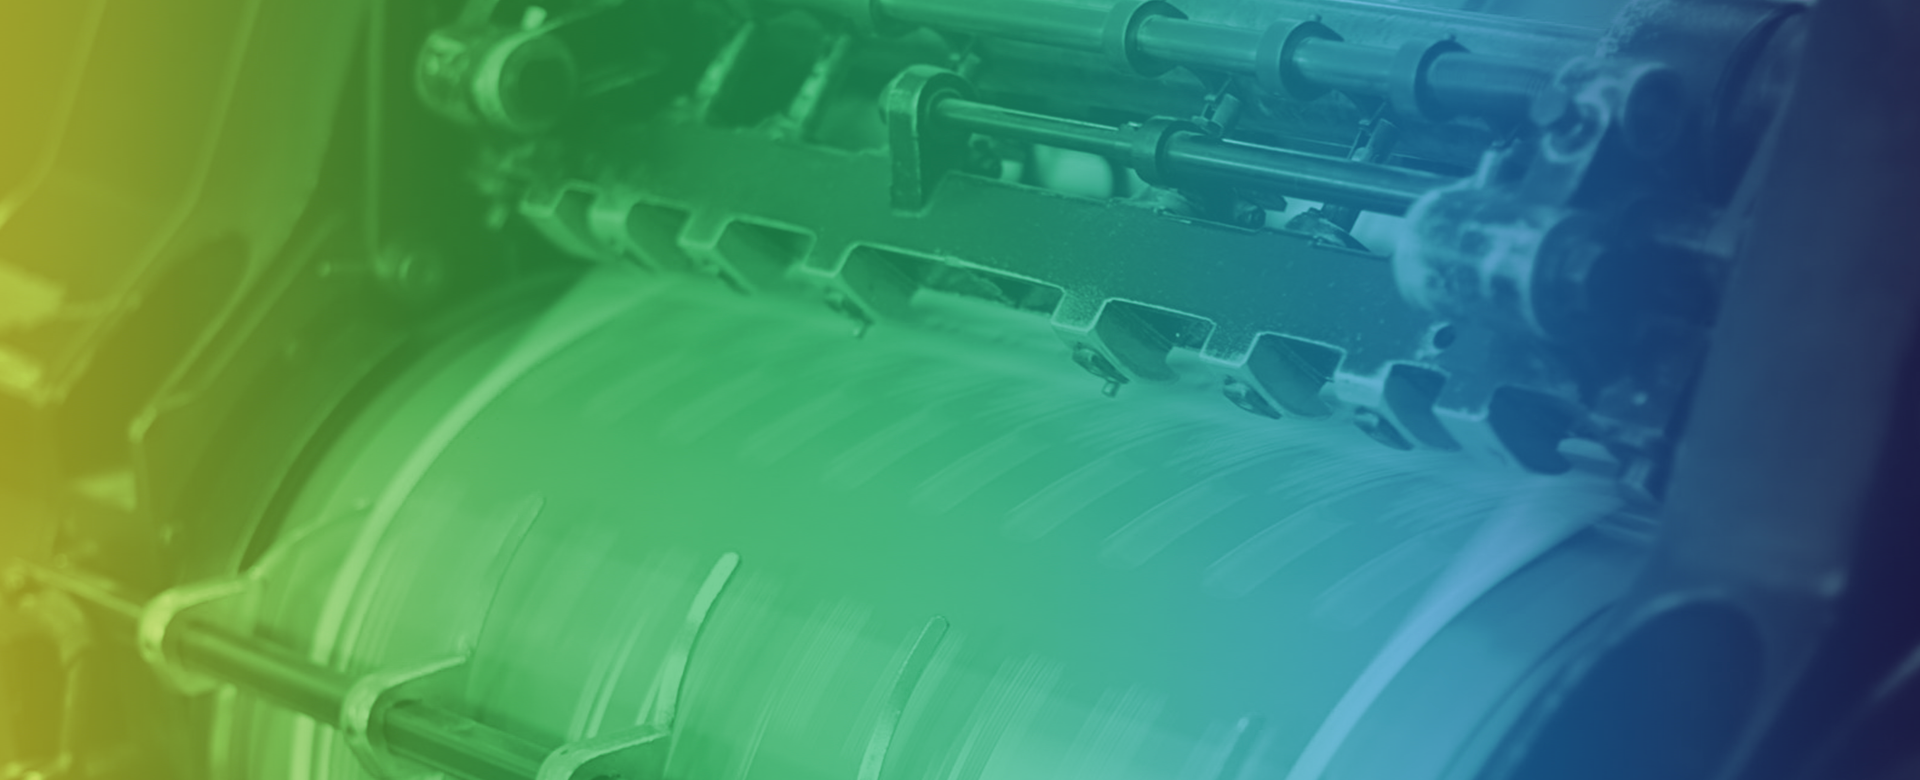 Word Perfect Print Product Ranges &Brochures | Print, Design, Marketing